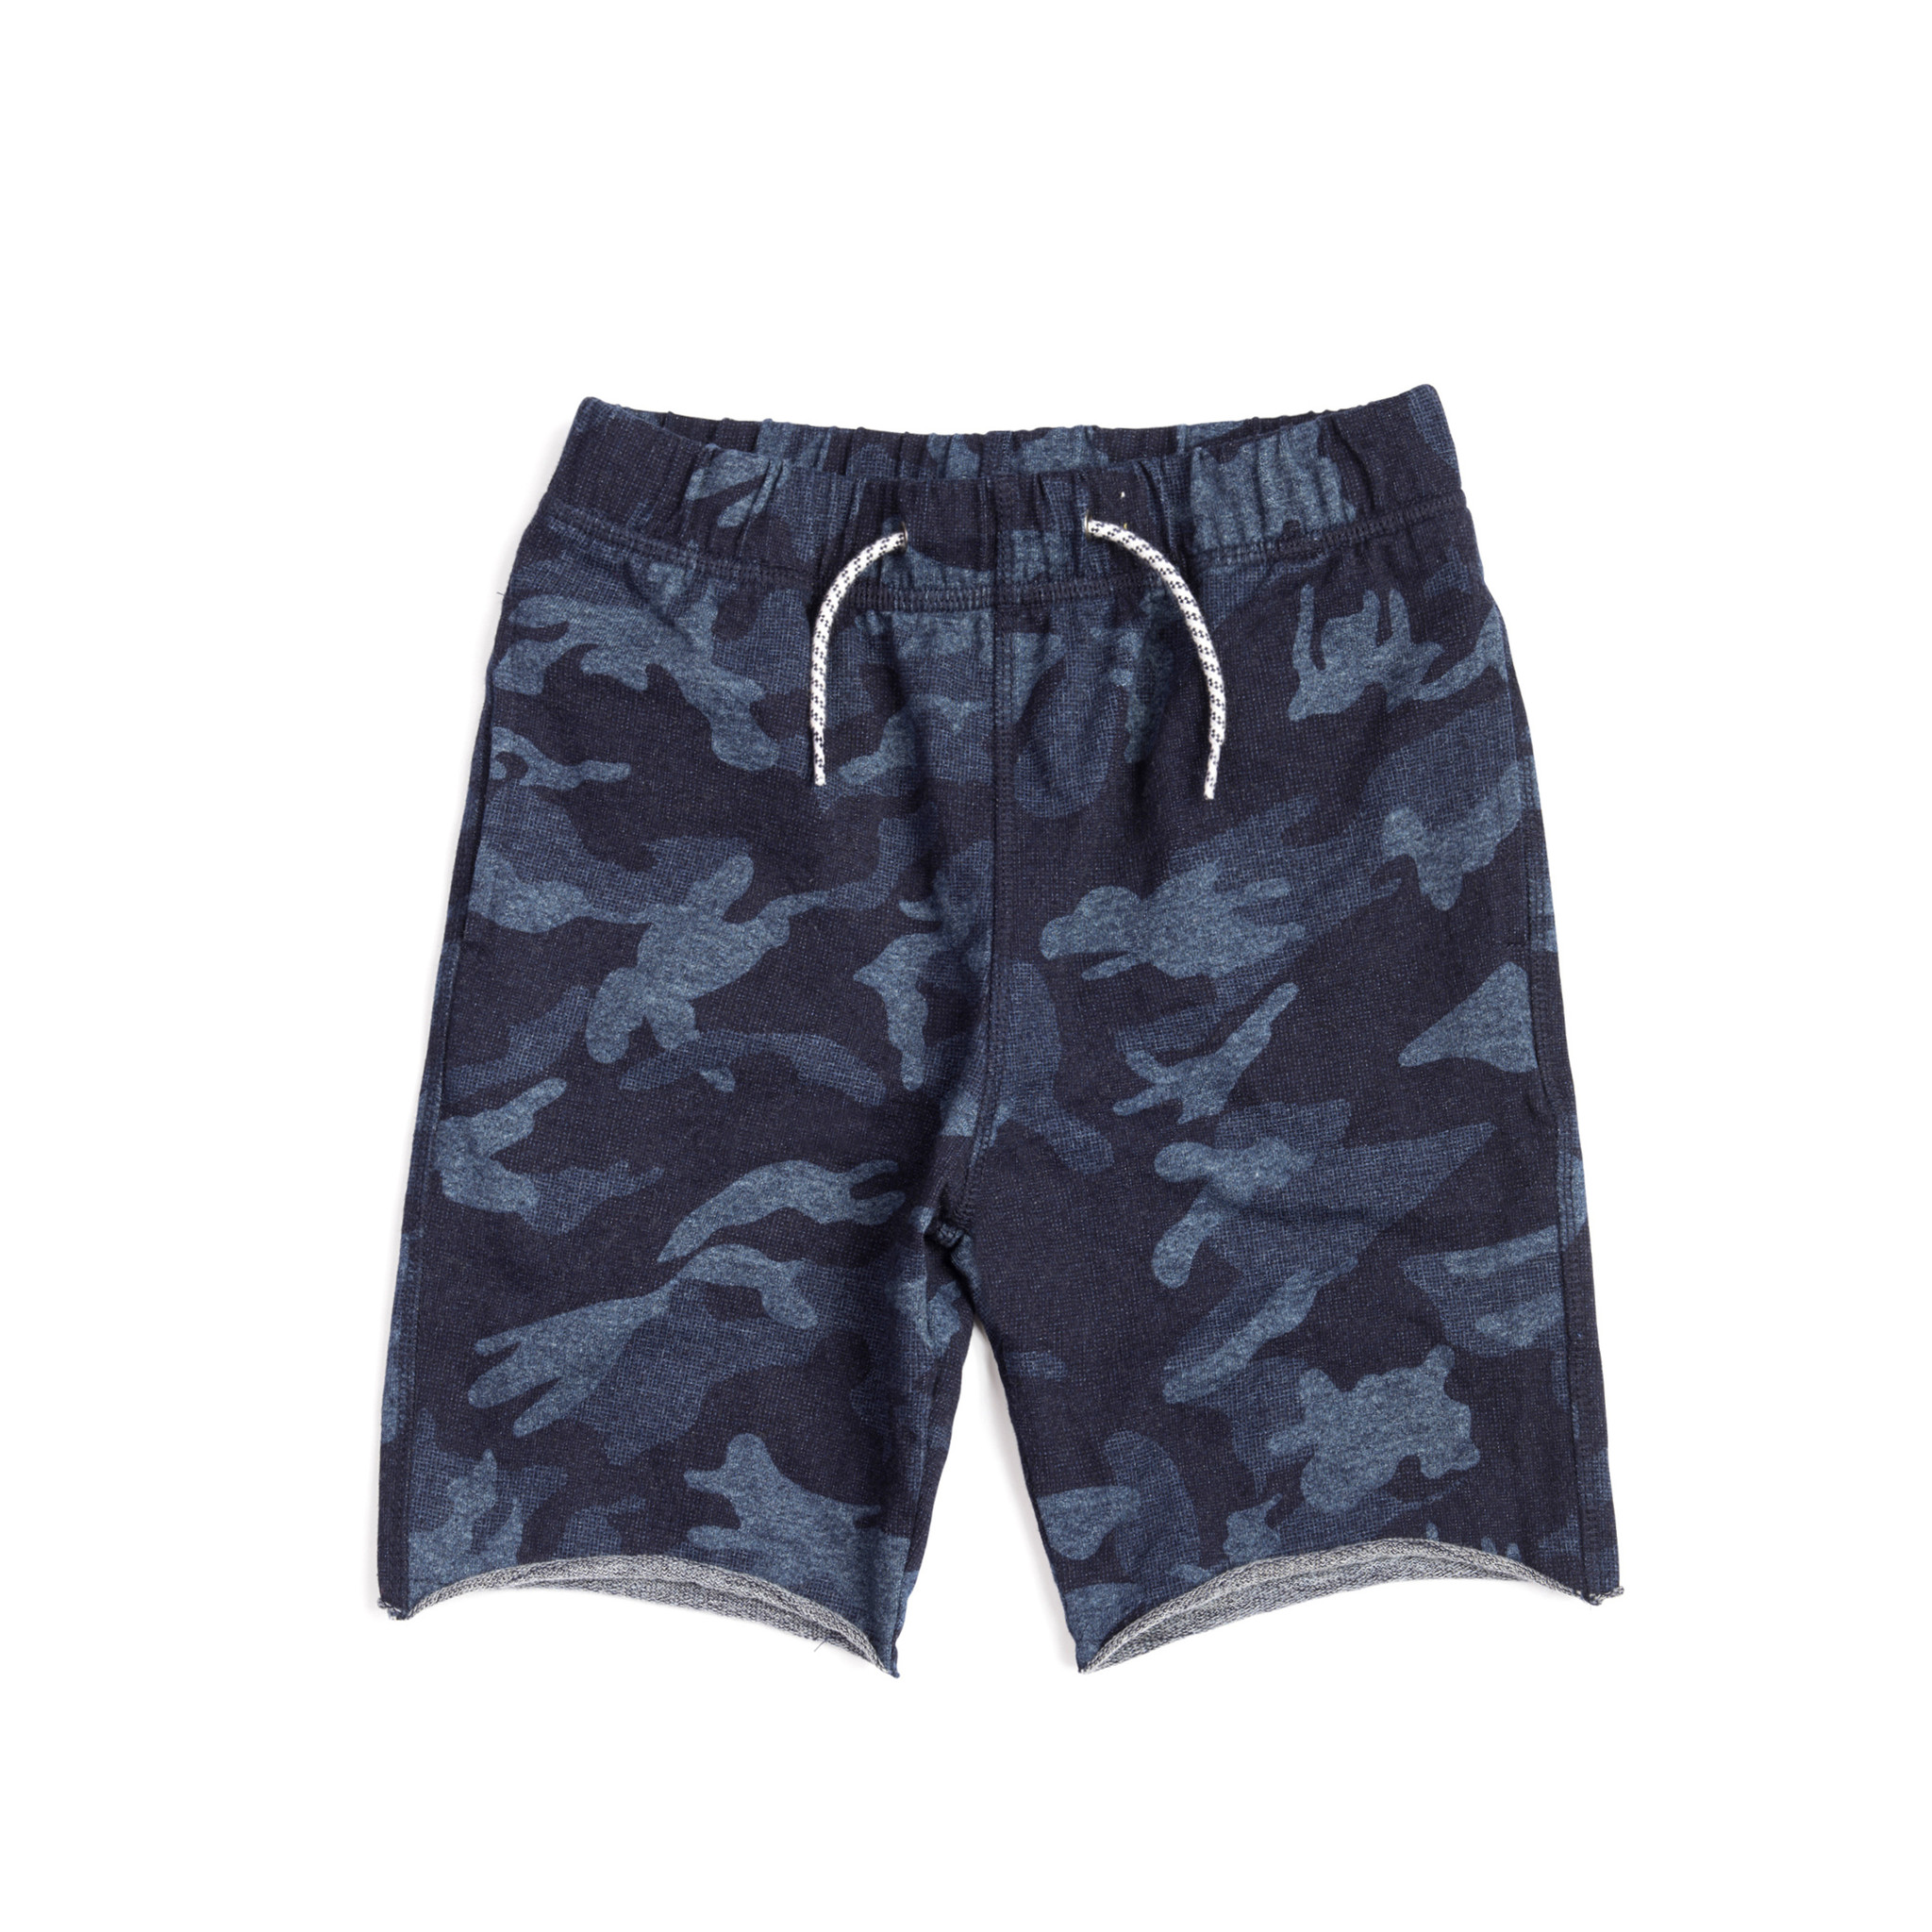 Appaman Digital Camo Infant Sweat Shorts